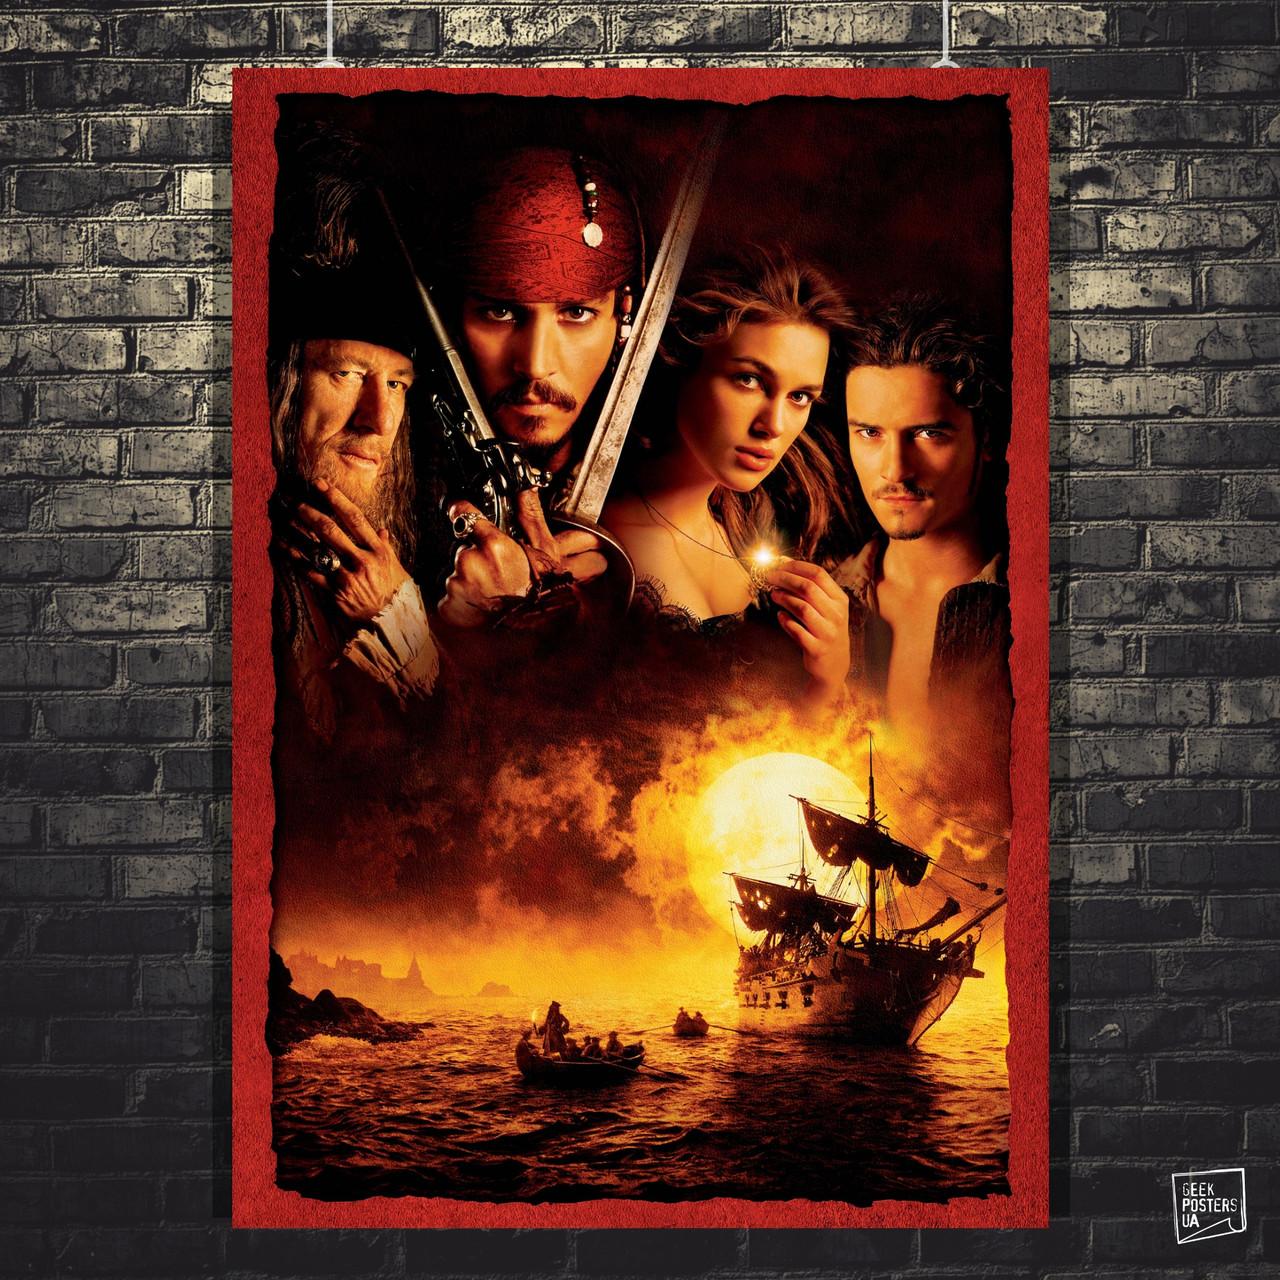 Постер Пираты Карибского Моря, Pirates of the Carribean. Размер 60x41см (A2). Глянцевая бумага